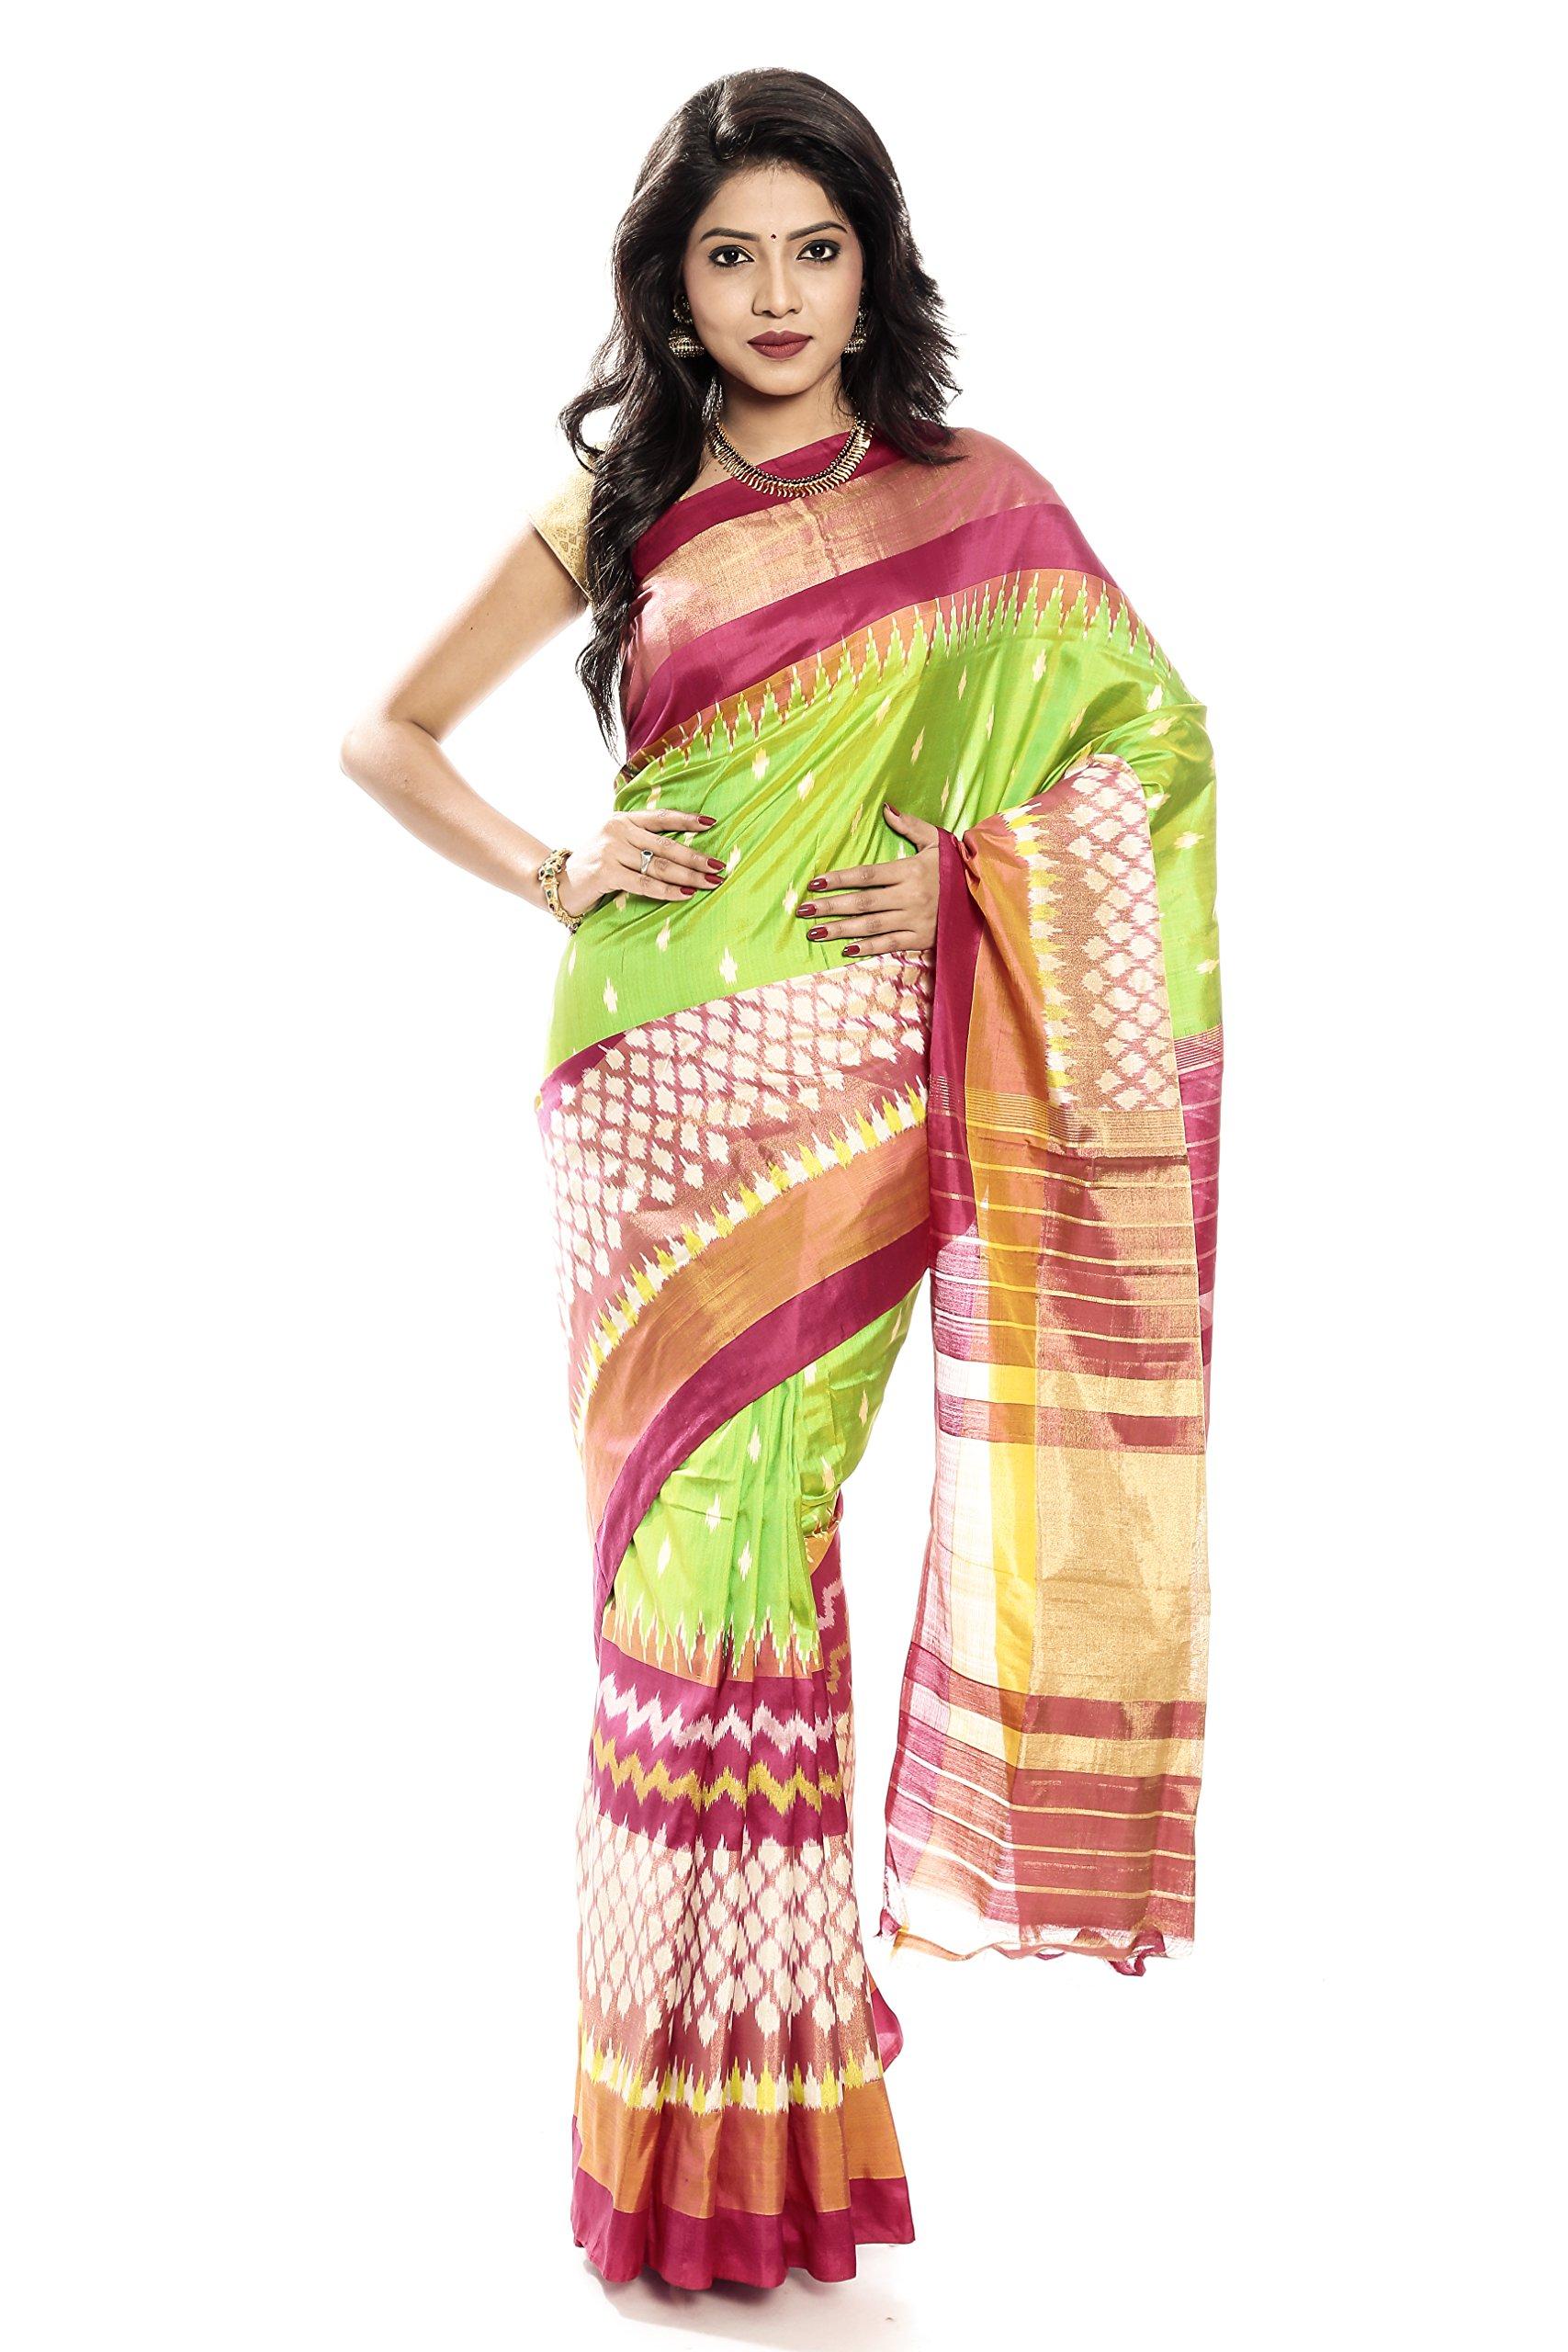 Mandakini — Indian Women's Pochampally - Handloom - Ikat Pure Silk Saree (Pink-Green ) (MK303)